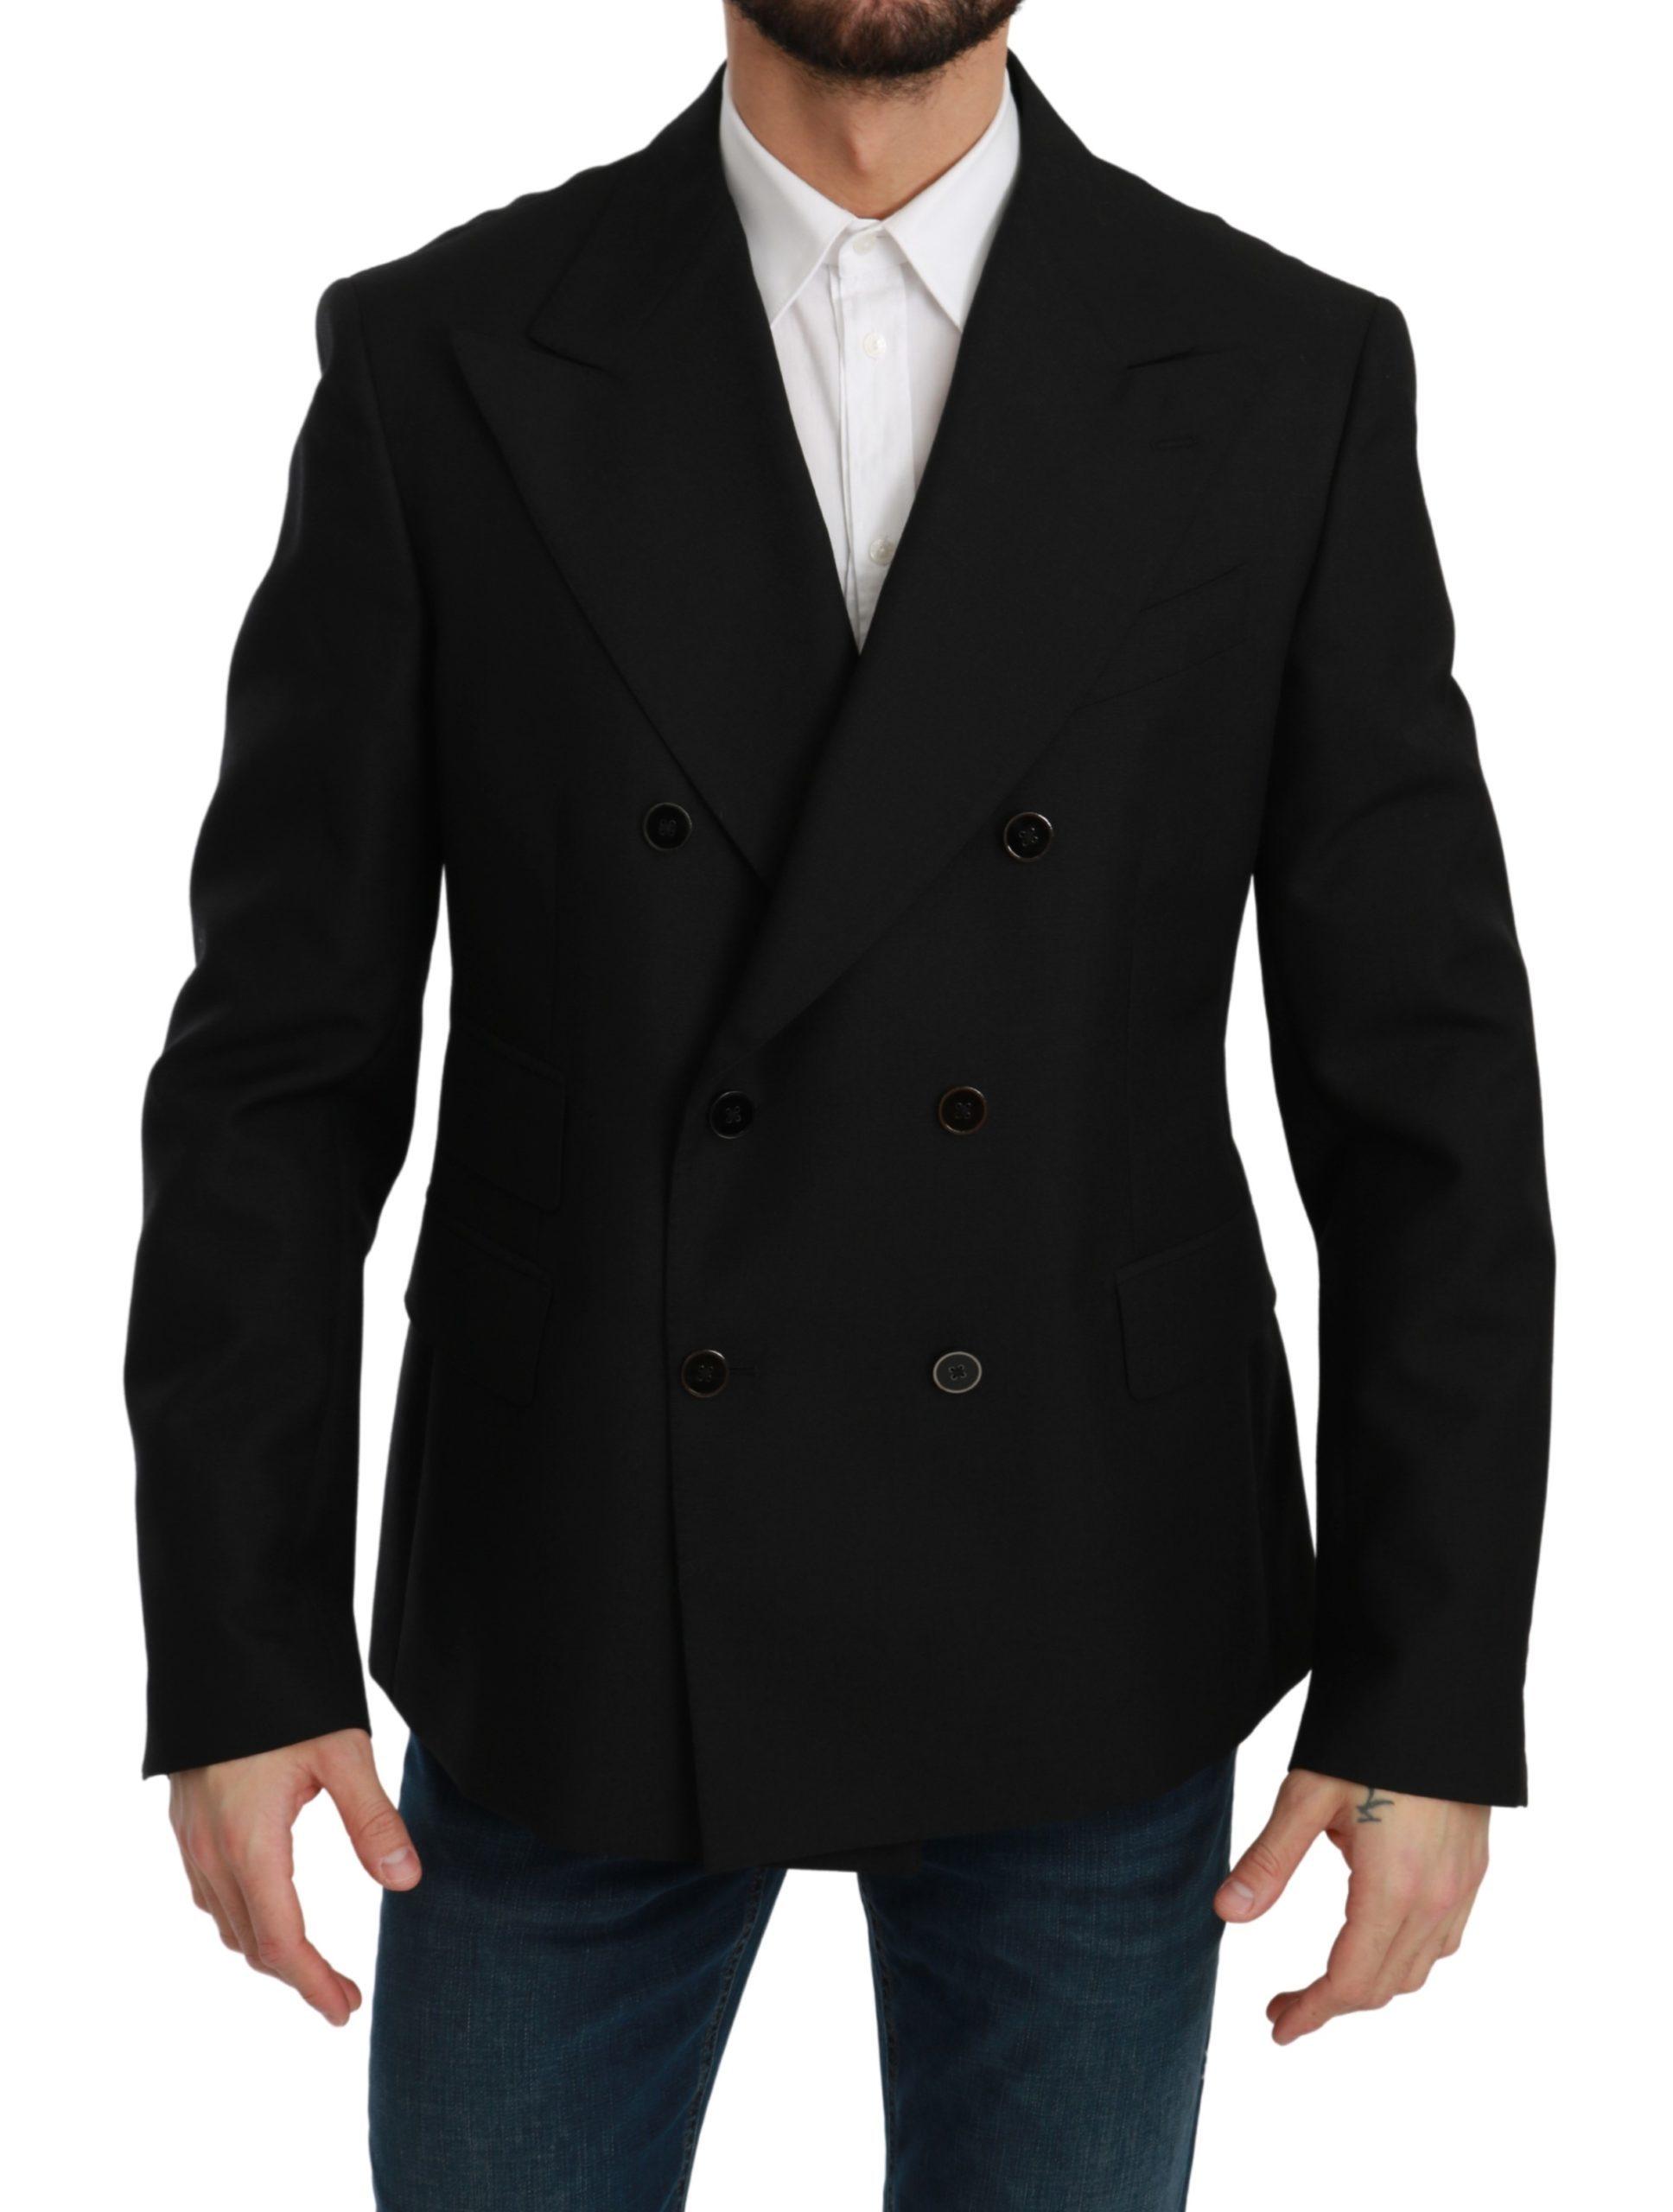 Dolce & Gabbana Men's Slim Fit Wool Blazer Black KOS1767 - IT52 | L